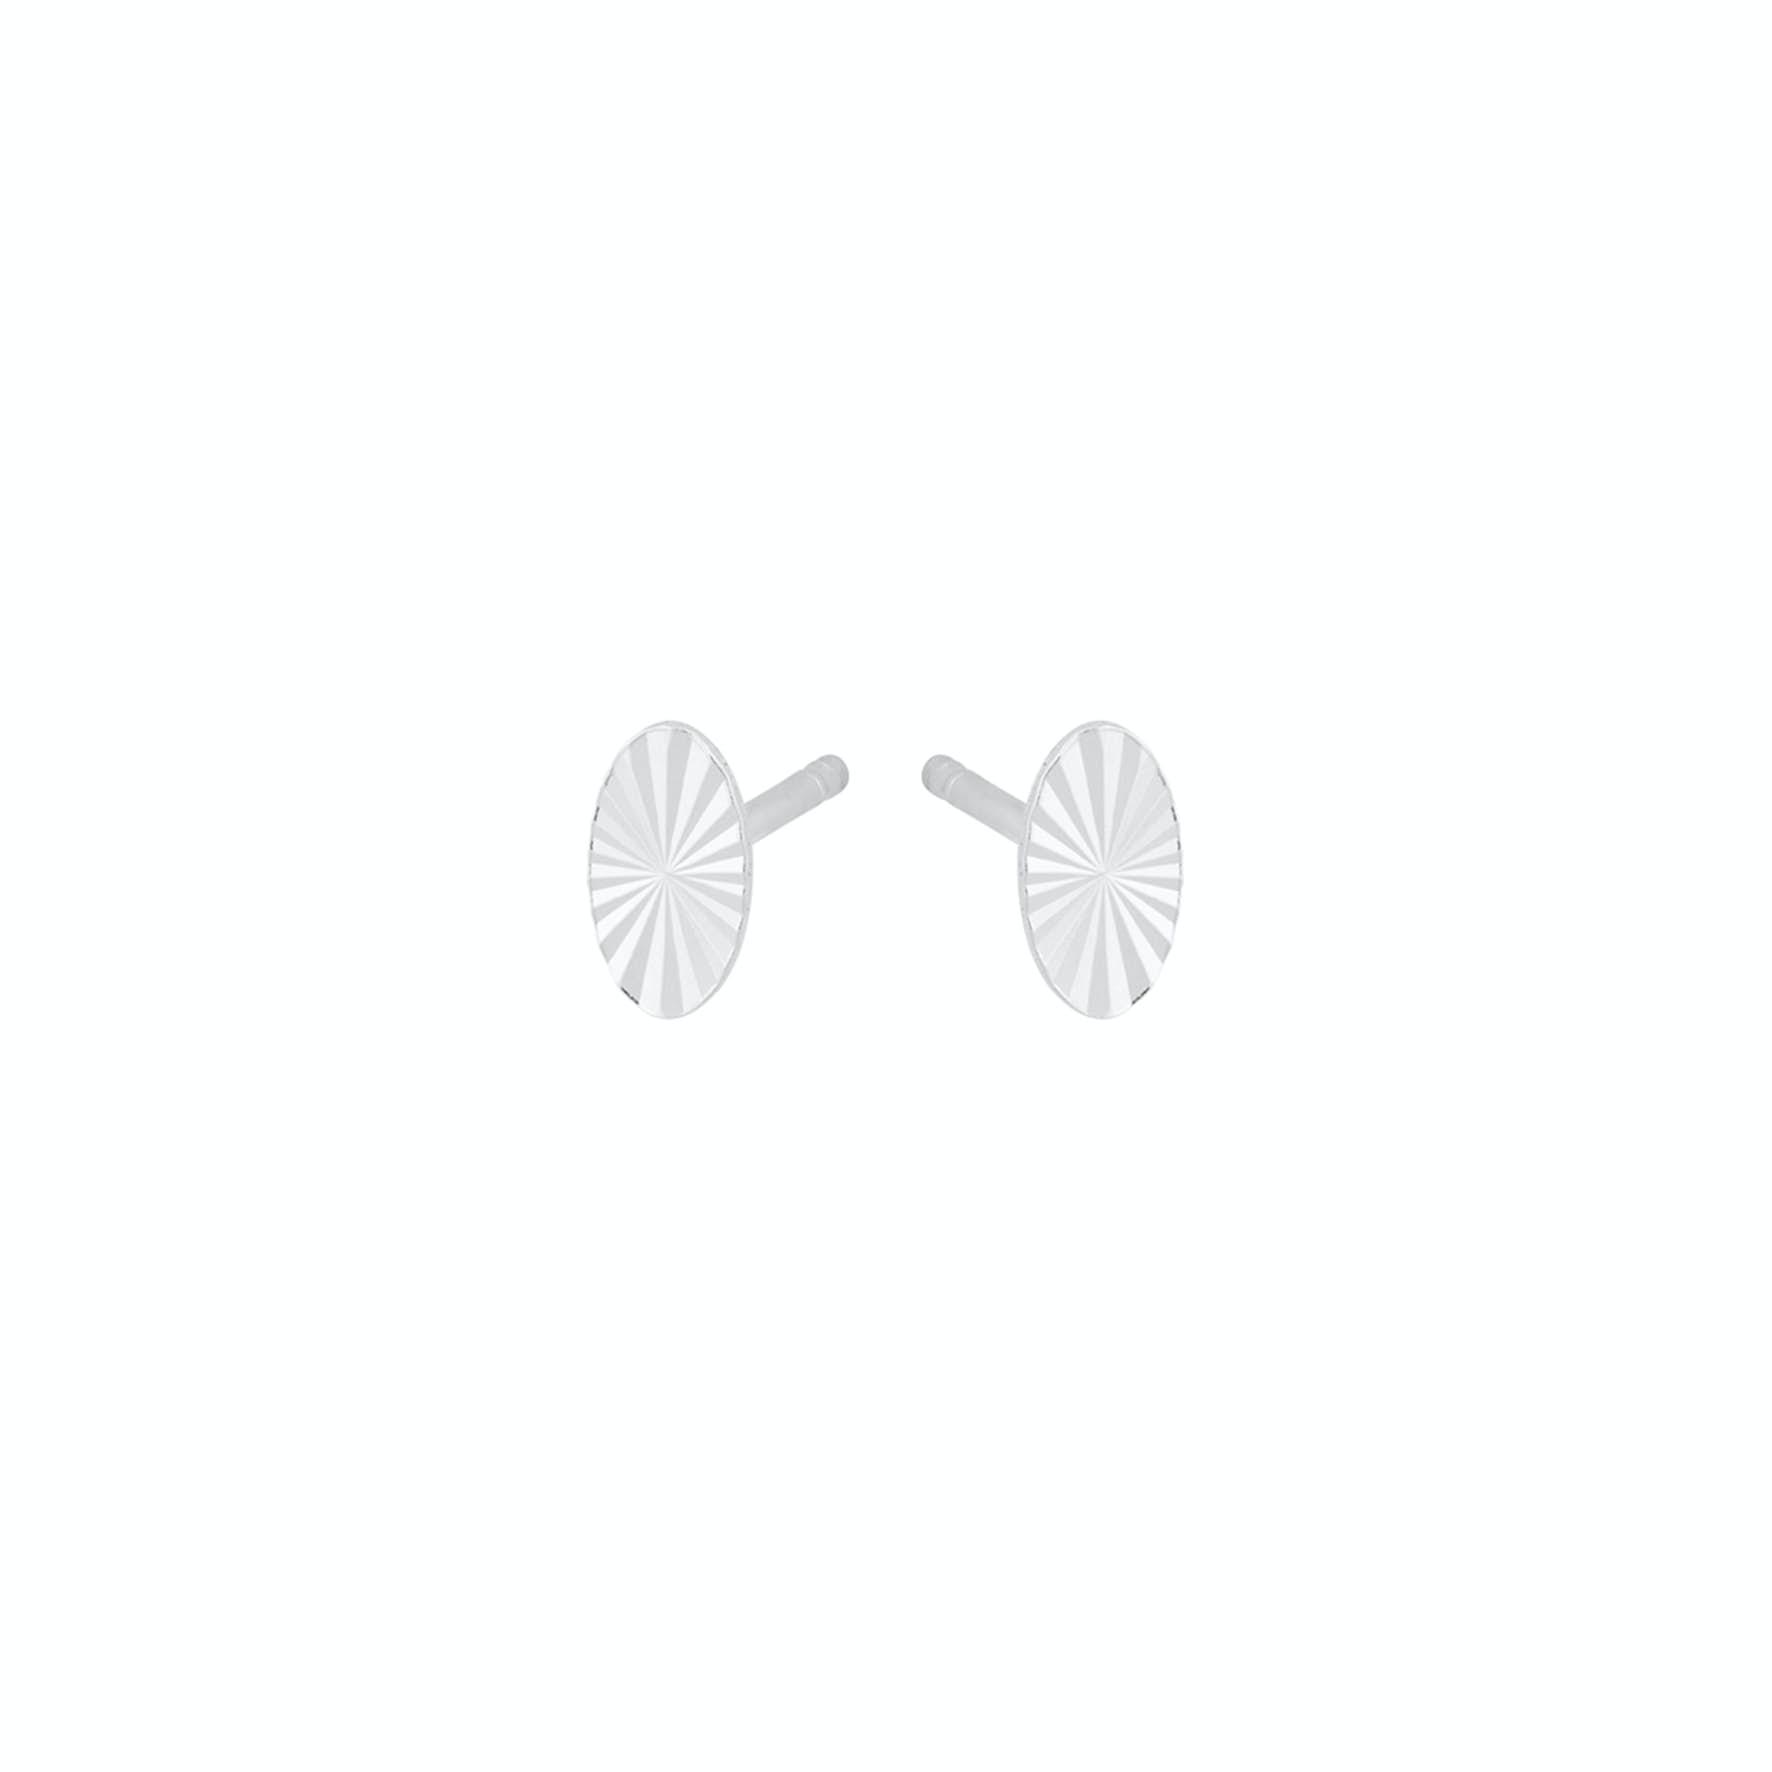 Ocean Stars Earsticks from Pernille Corydon in Silver Sterling 925